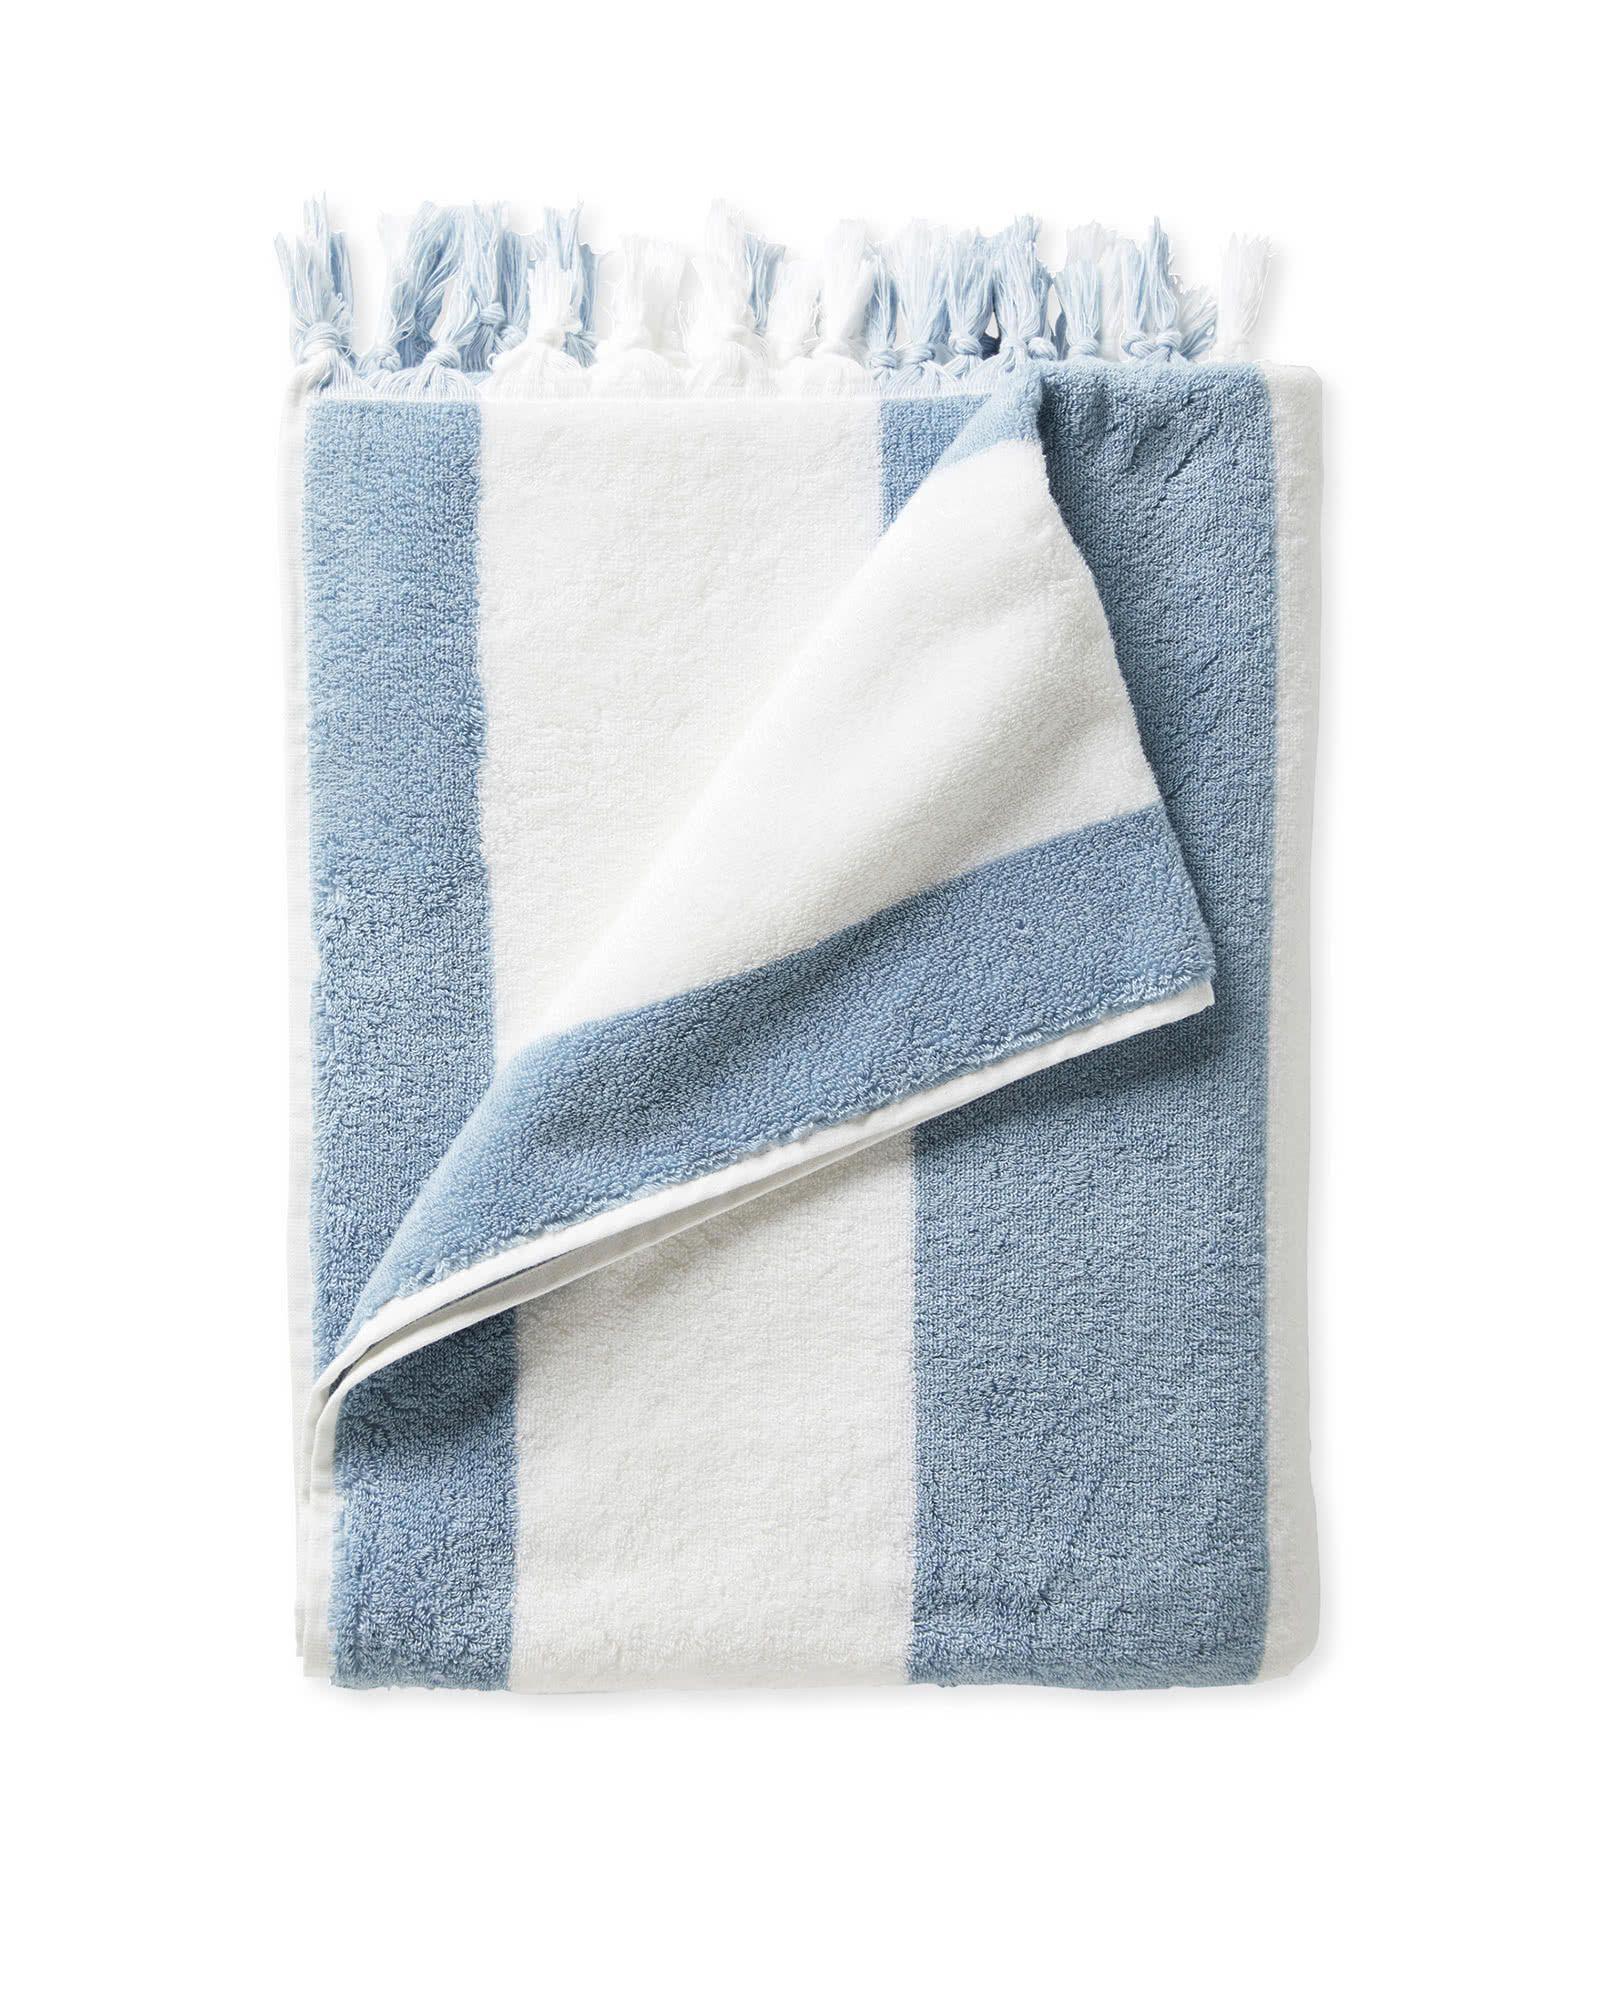 Mallorca Beach Towel Mallorca Beaches Towel Beach Towel